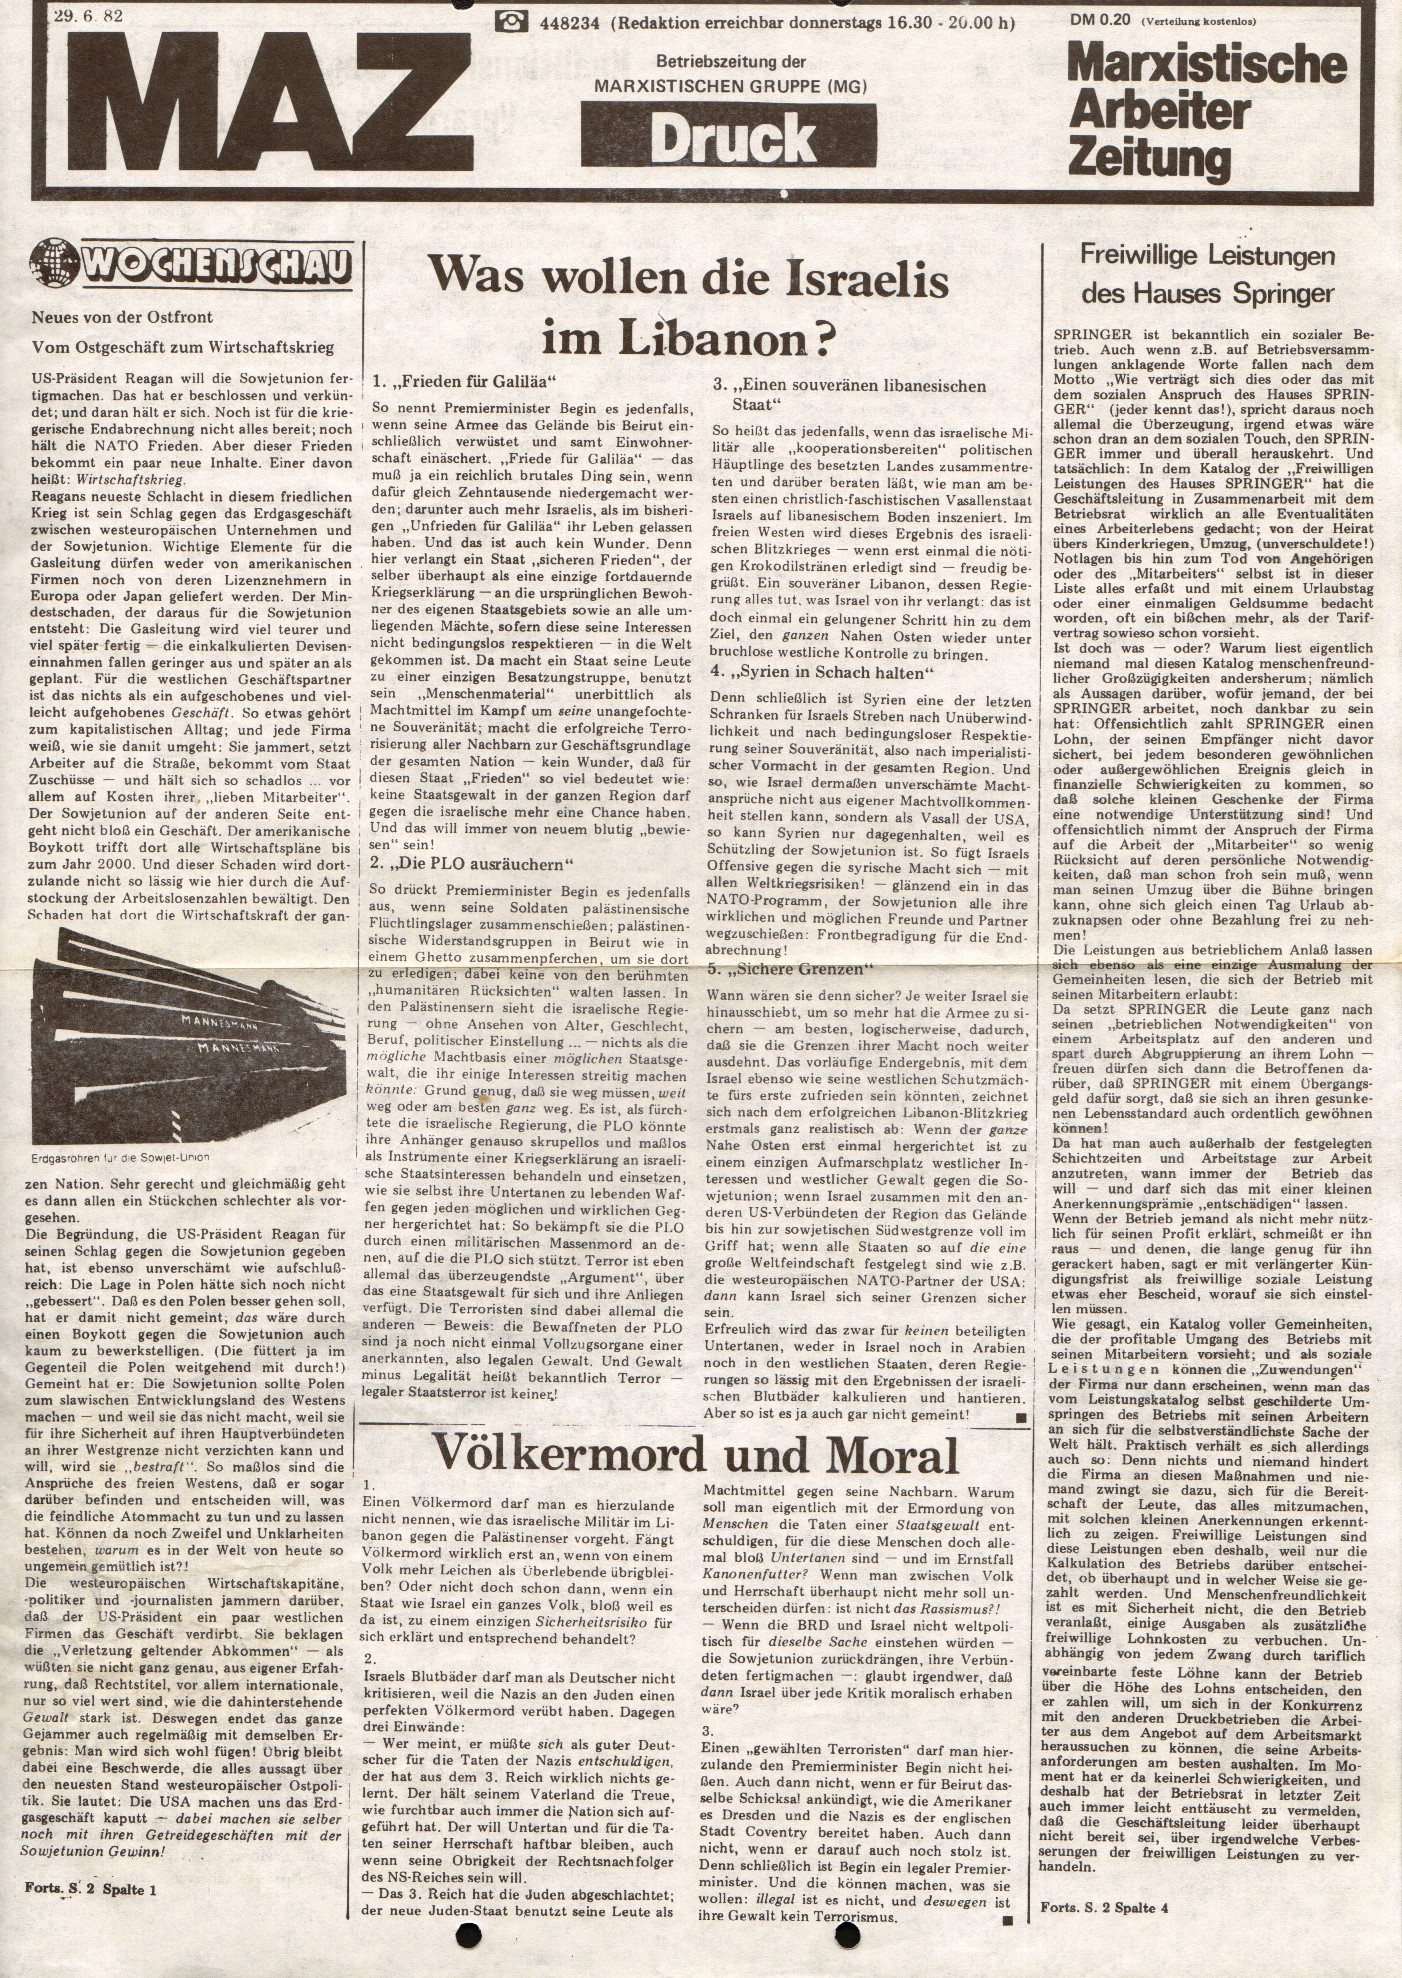 Hamburg_MG_MAZ_Druck_19820629_01